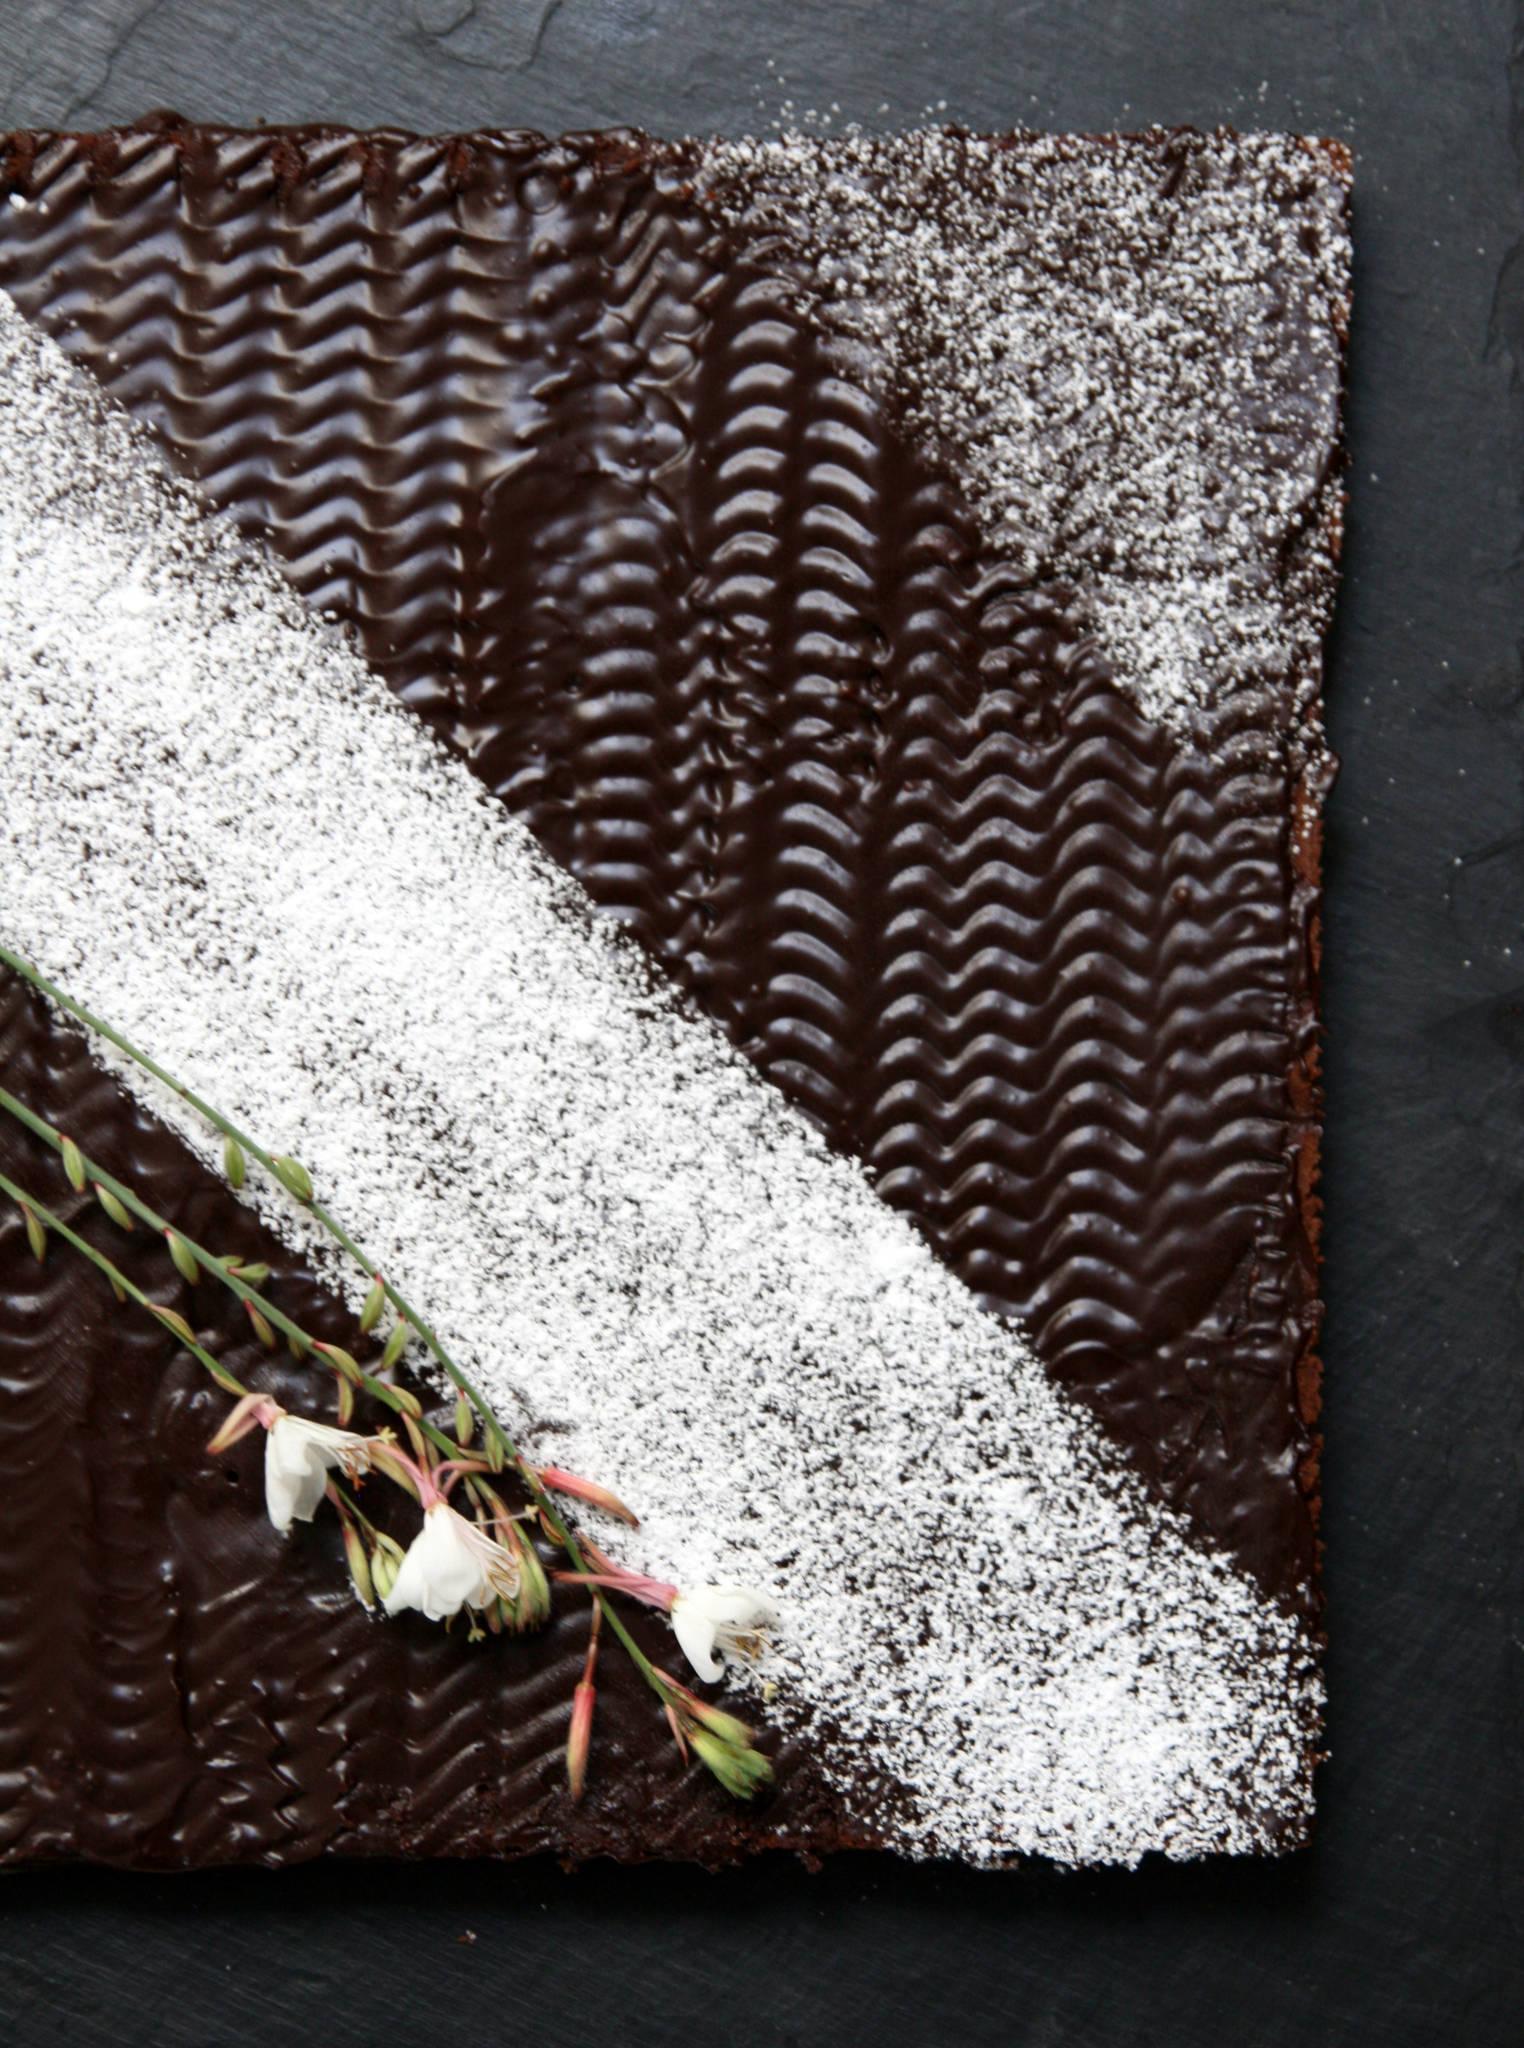 Gâteau au chocolat au mascarpone de Cyril Lignac